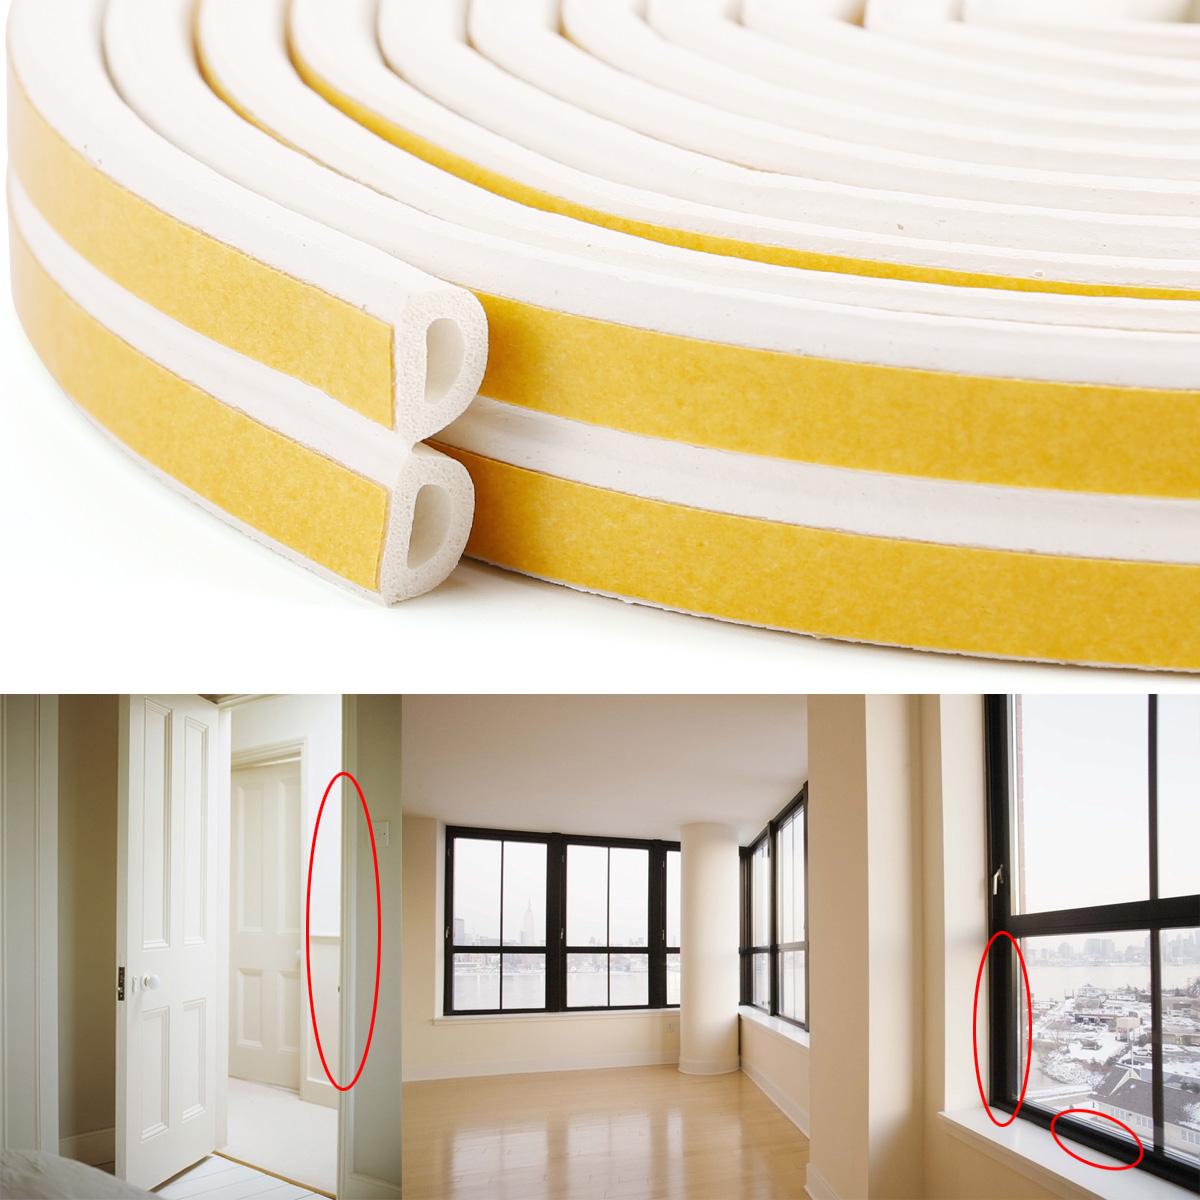 fensterdichtung dichtung d fenster gummidichtung. Black Bedroom Furniture Sets. Home Design Ideas